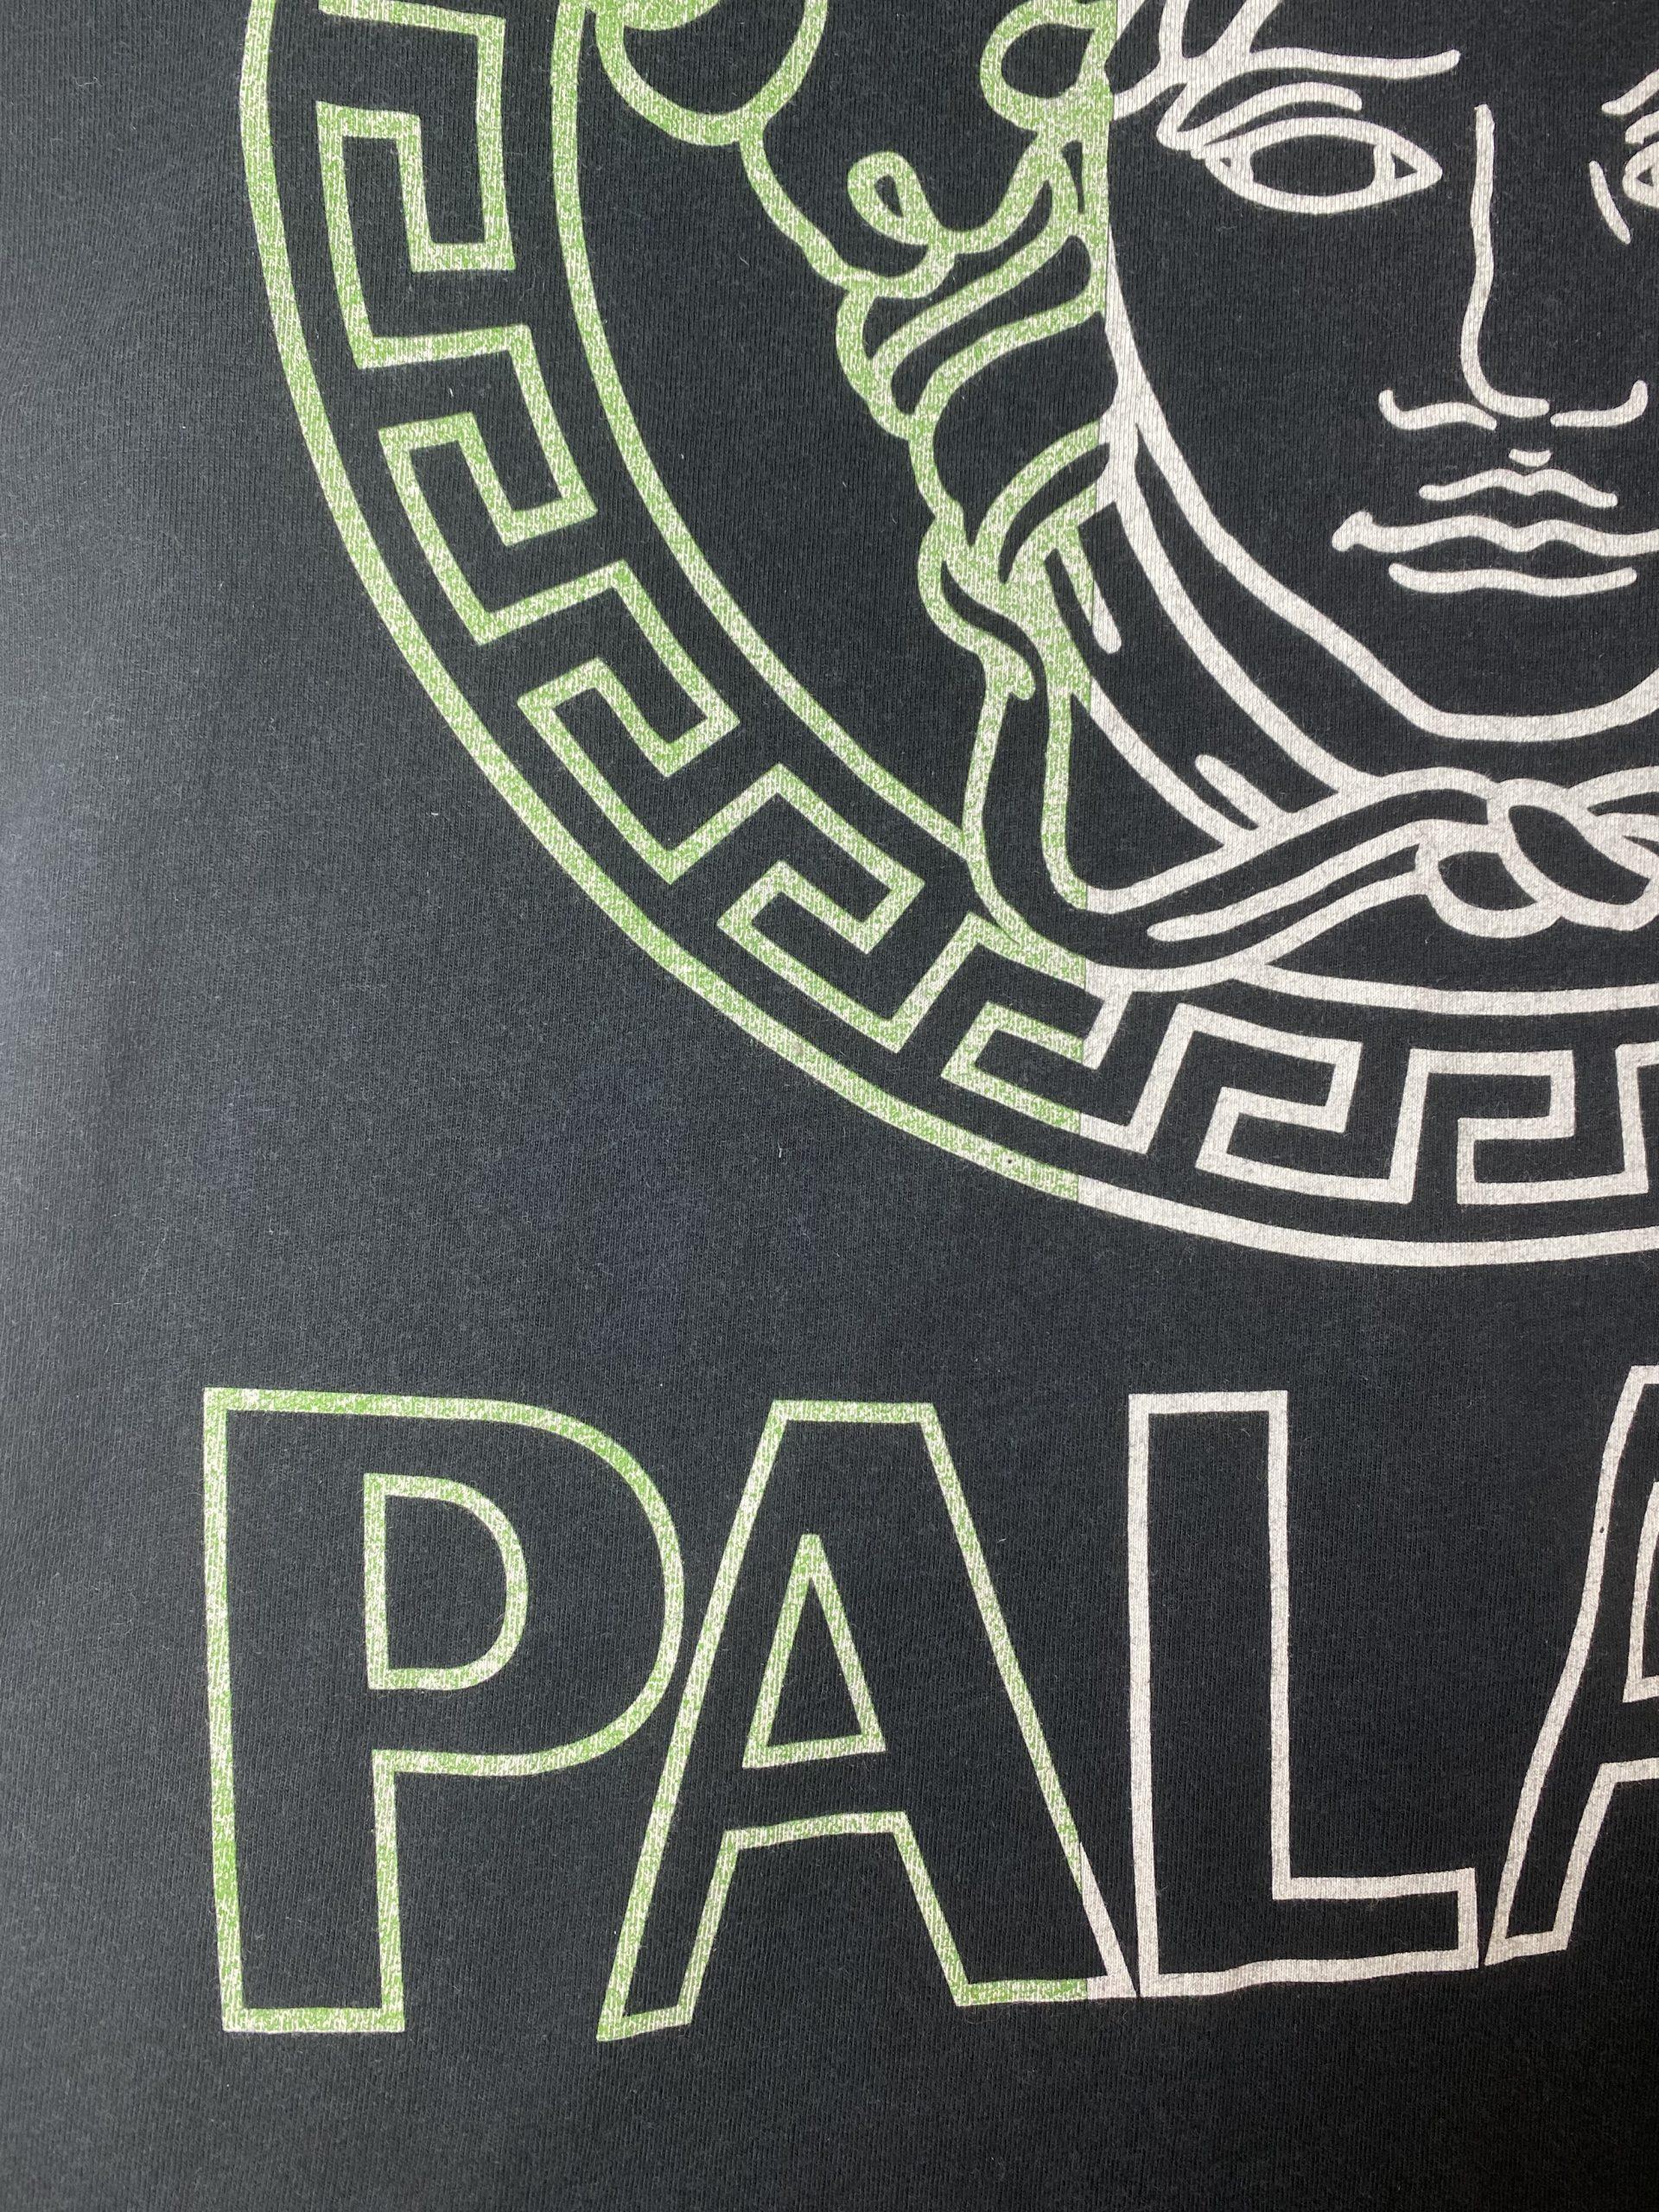 palace versafe tee black medium fading 1